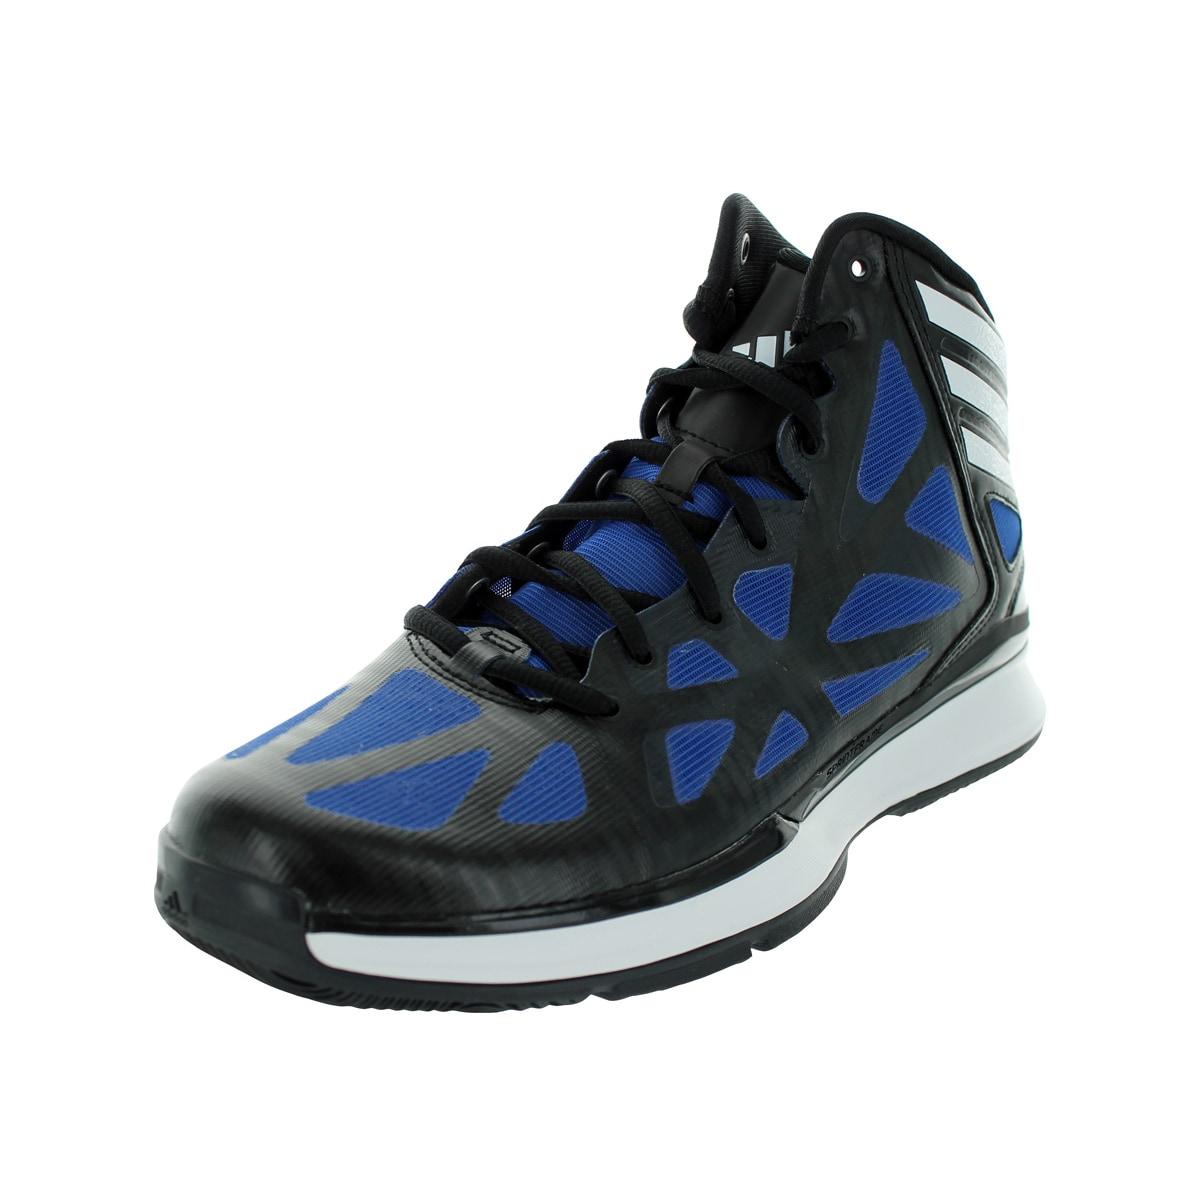 Adidas Men's Crazy Shadow 2 Black/RunWhite/Colroy Basketb...